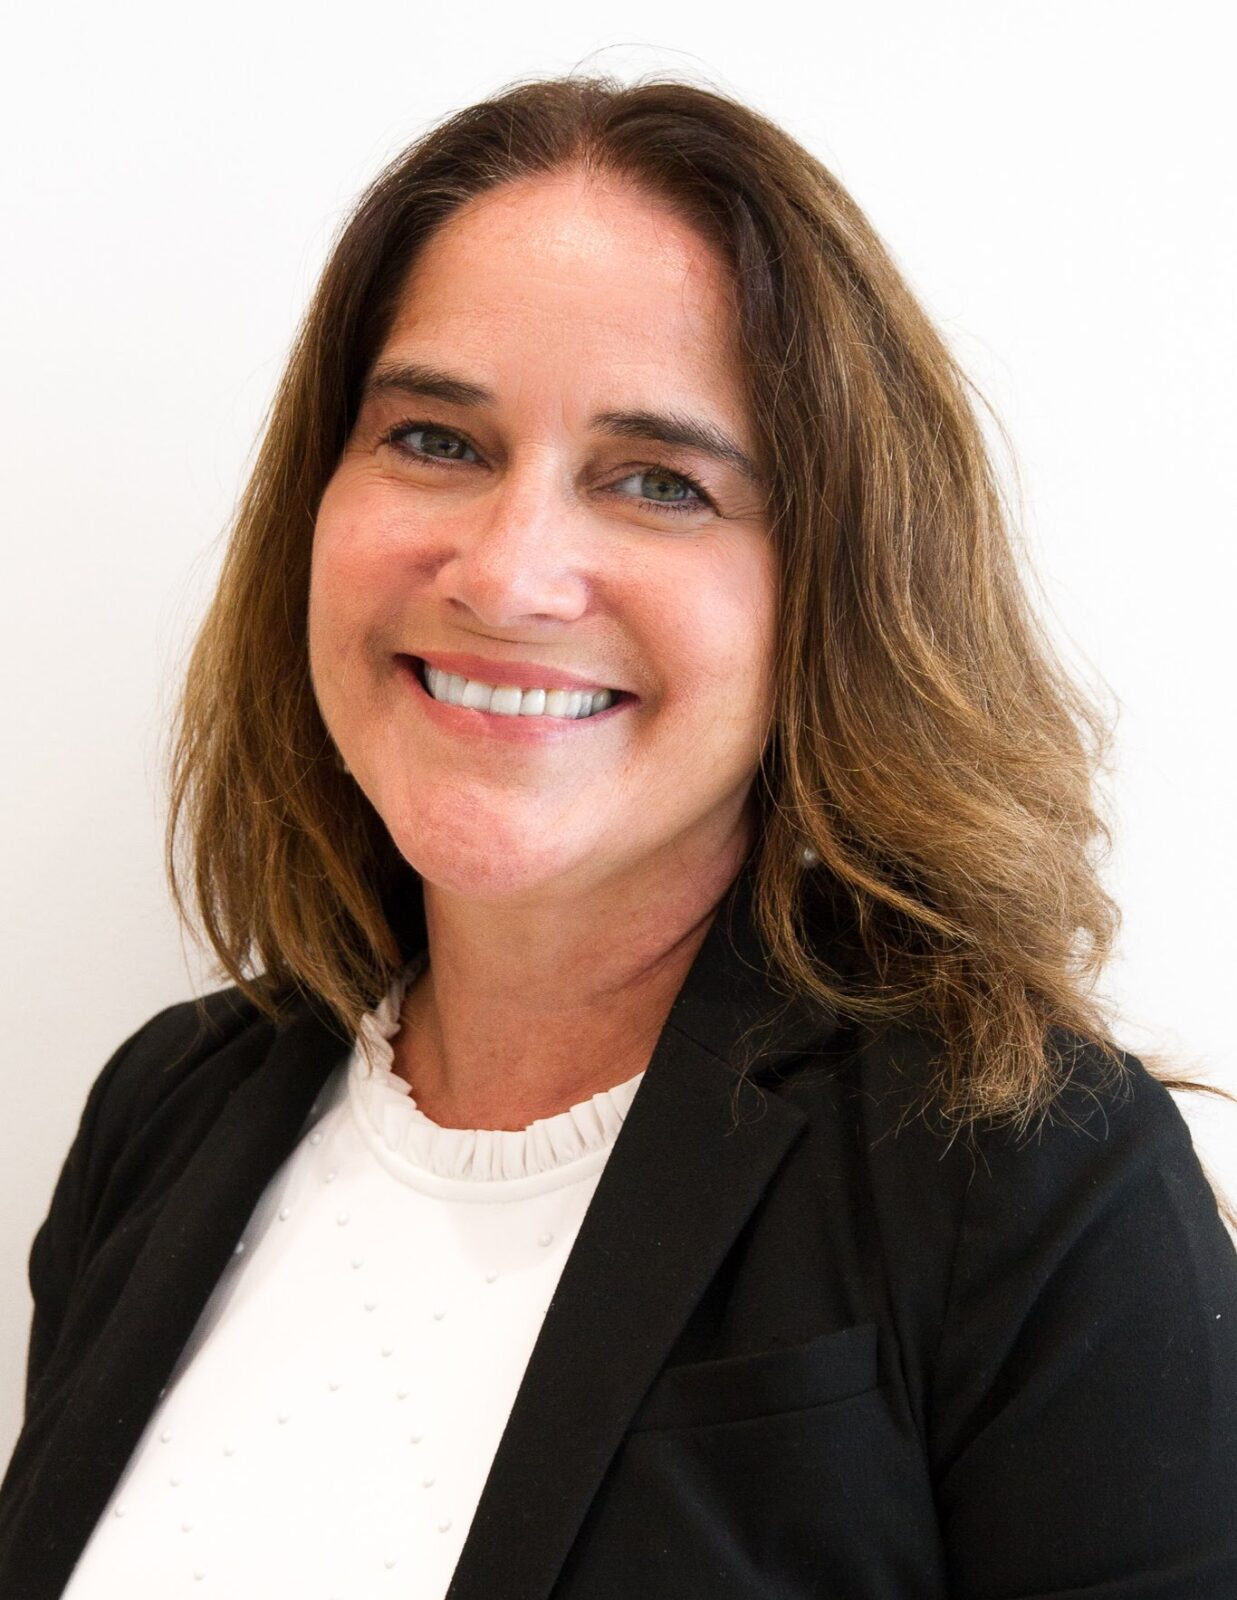 15 - Janet Kerr - Event & Marketing Coordinator